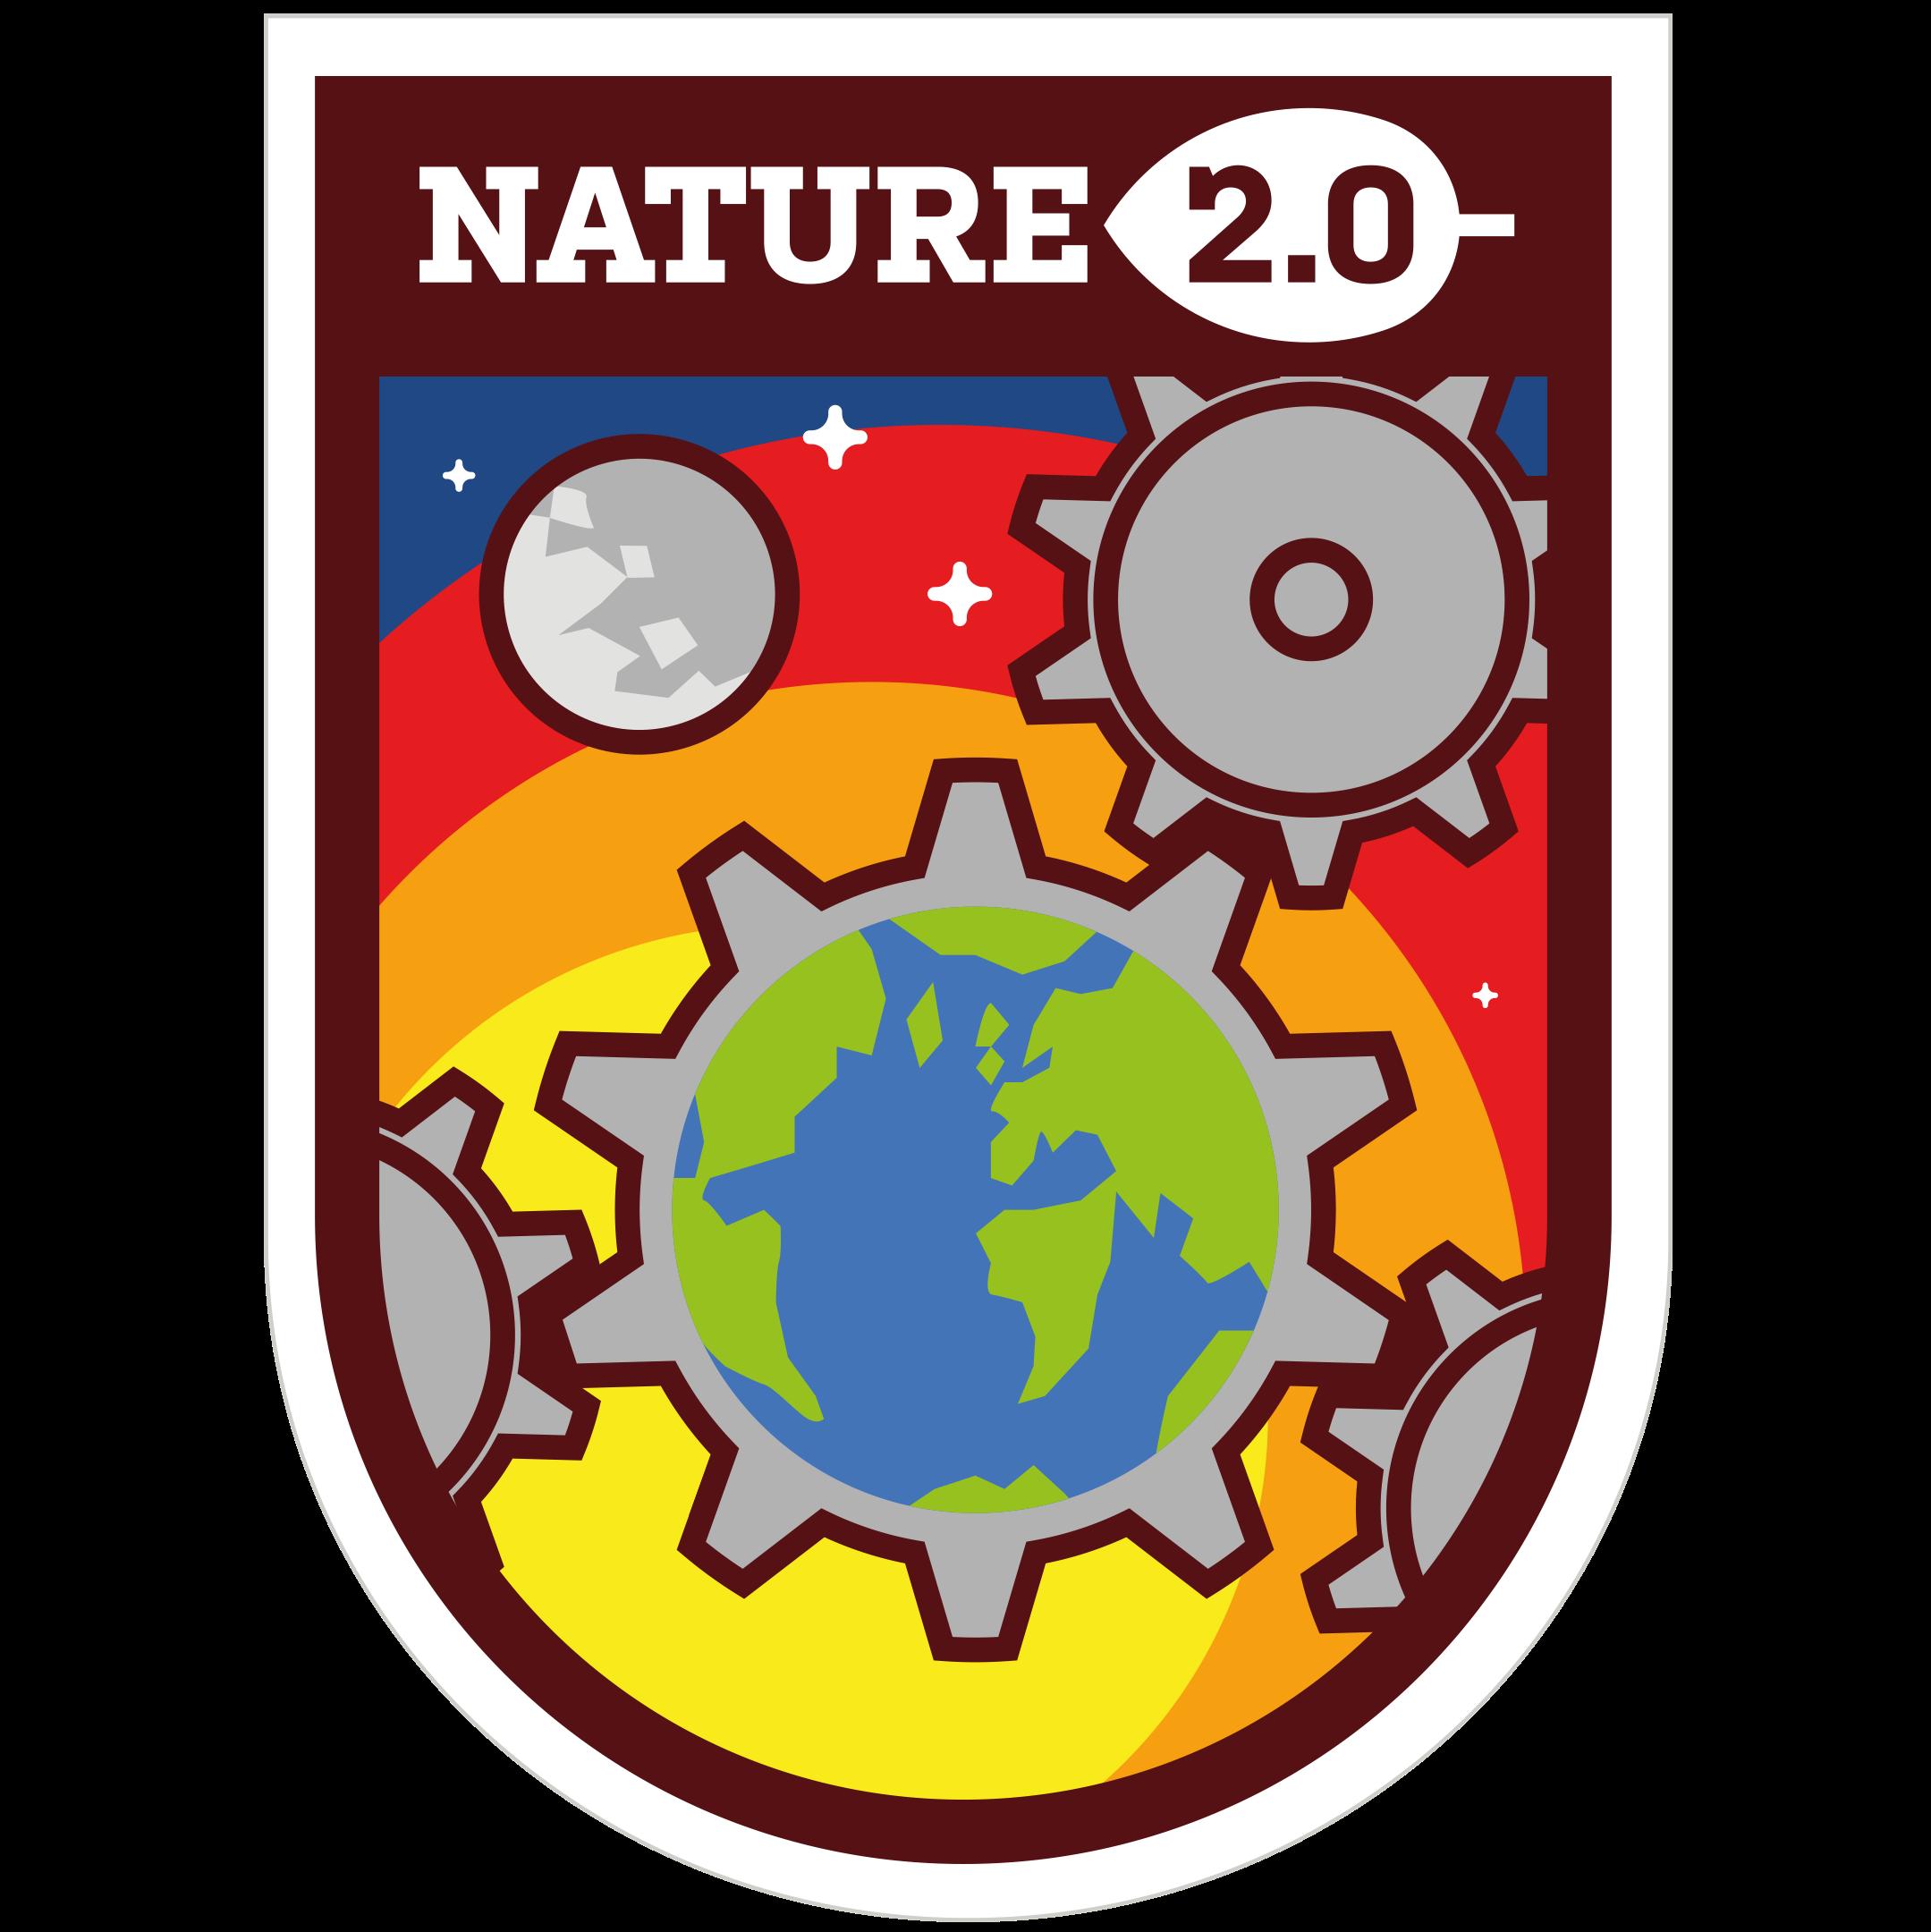 Nature 2.0